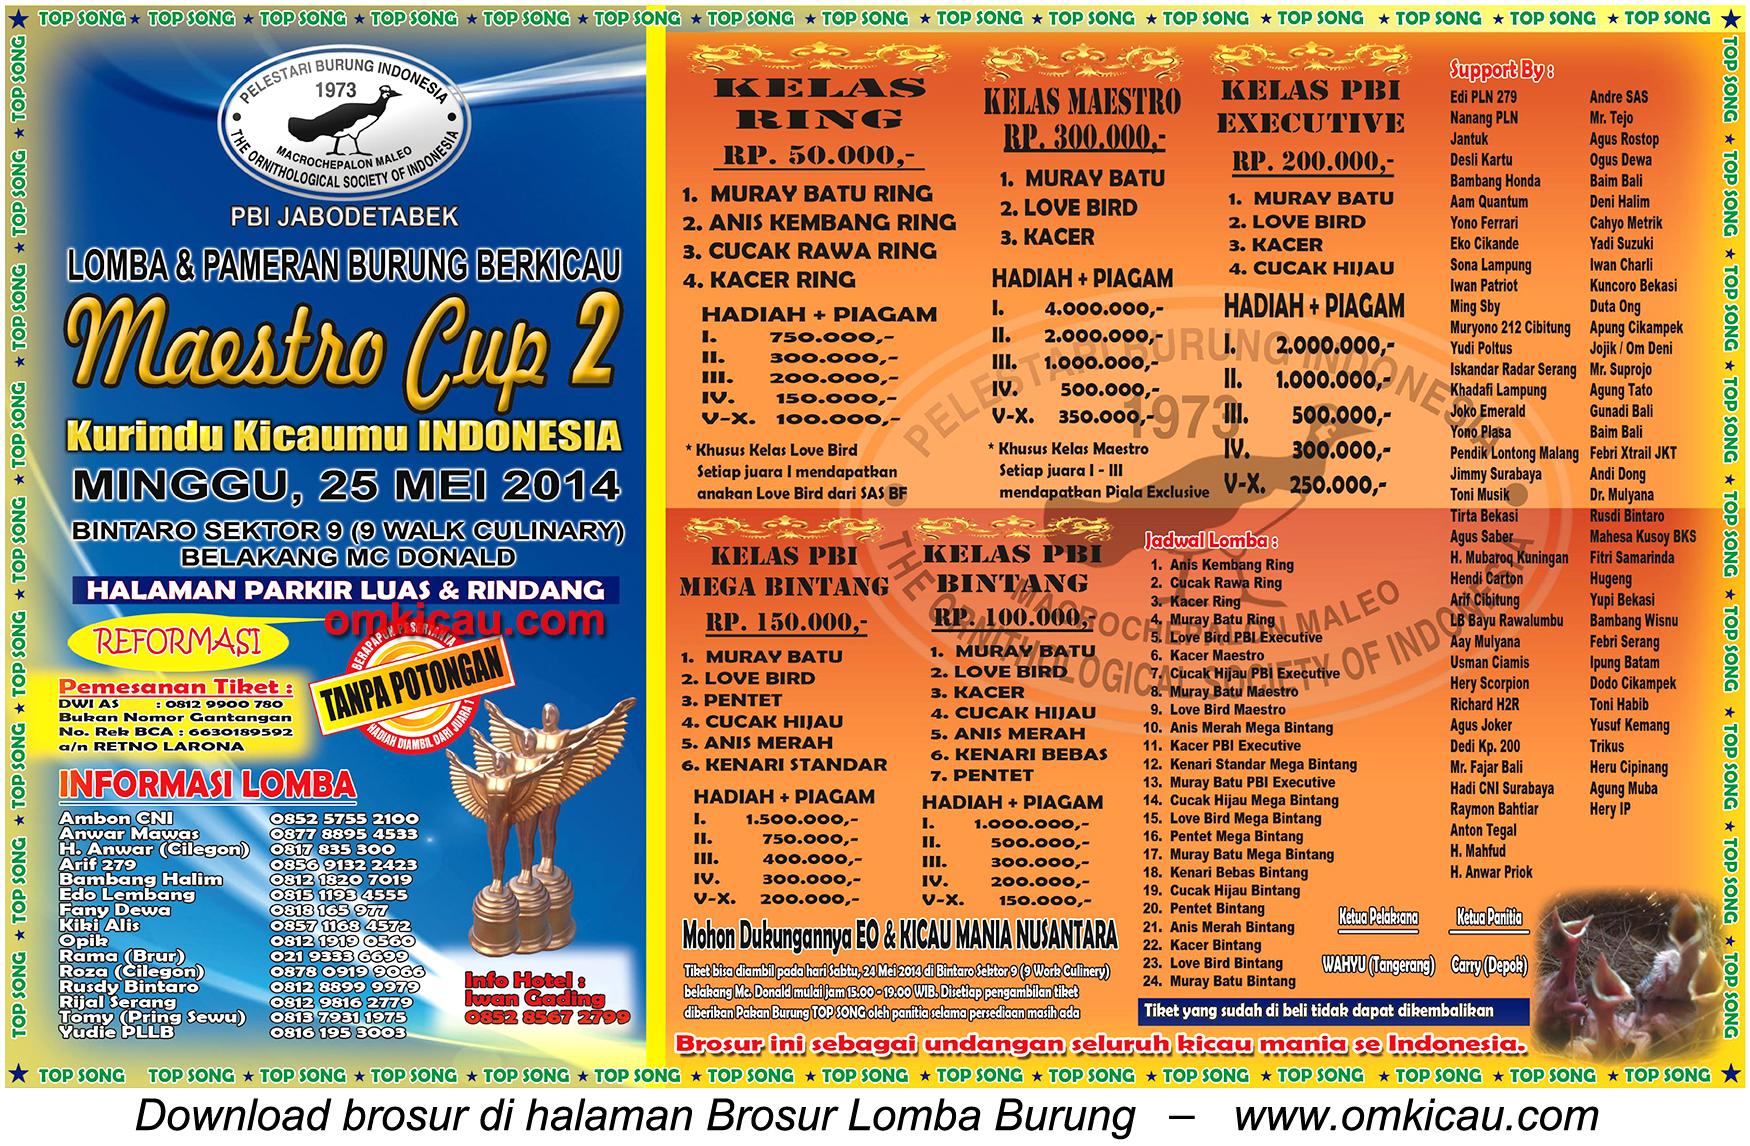 Brosur Lomba Burung Berkicau Maestro Cup 2 - Tangerang Selatan, 25 Mei 2014